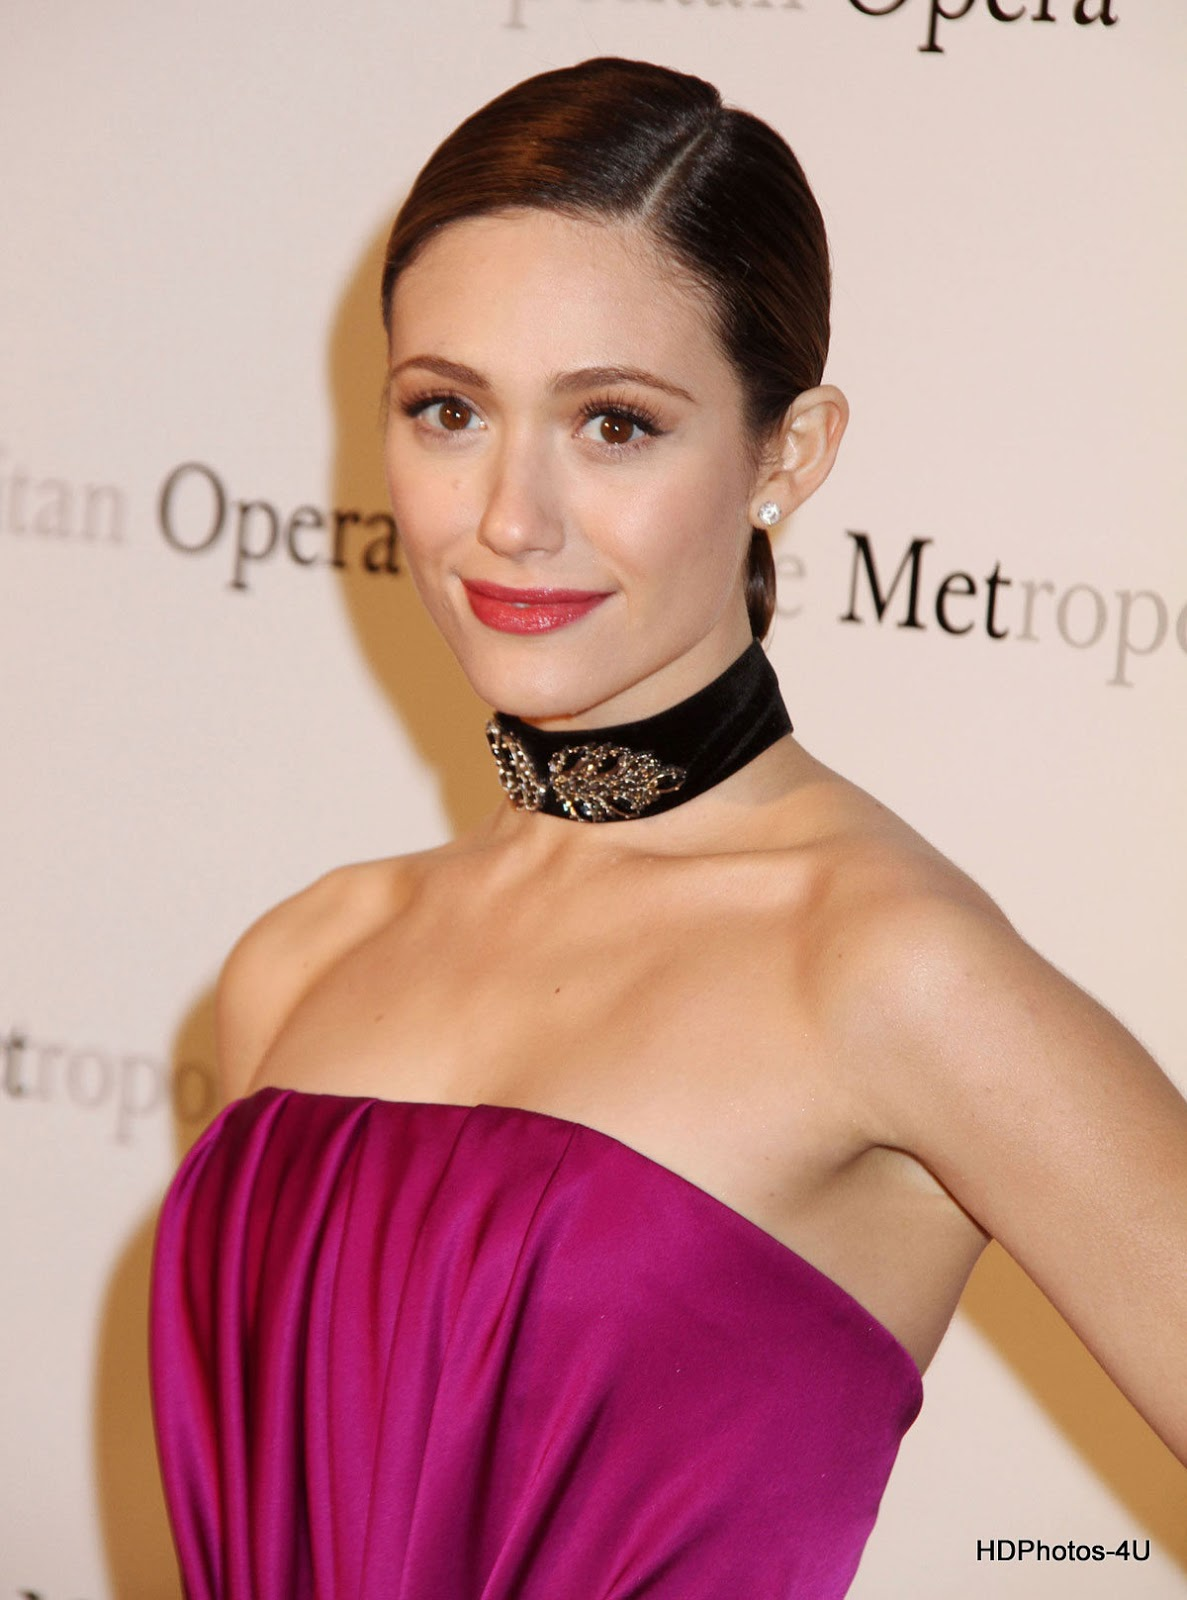 4K Photos of Emmy Rossum in Pink Dress at Metropolitan Opera Gala Premiere of Manon in New York